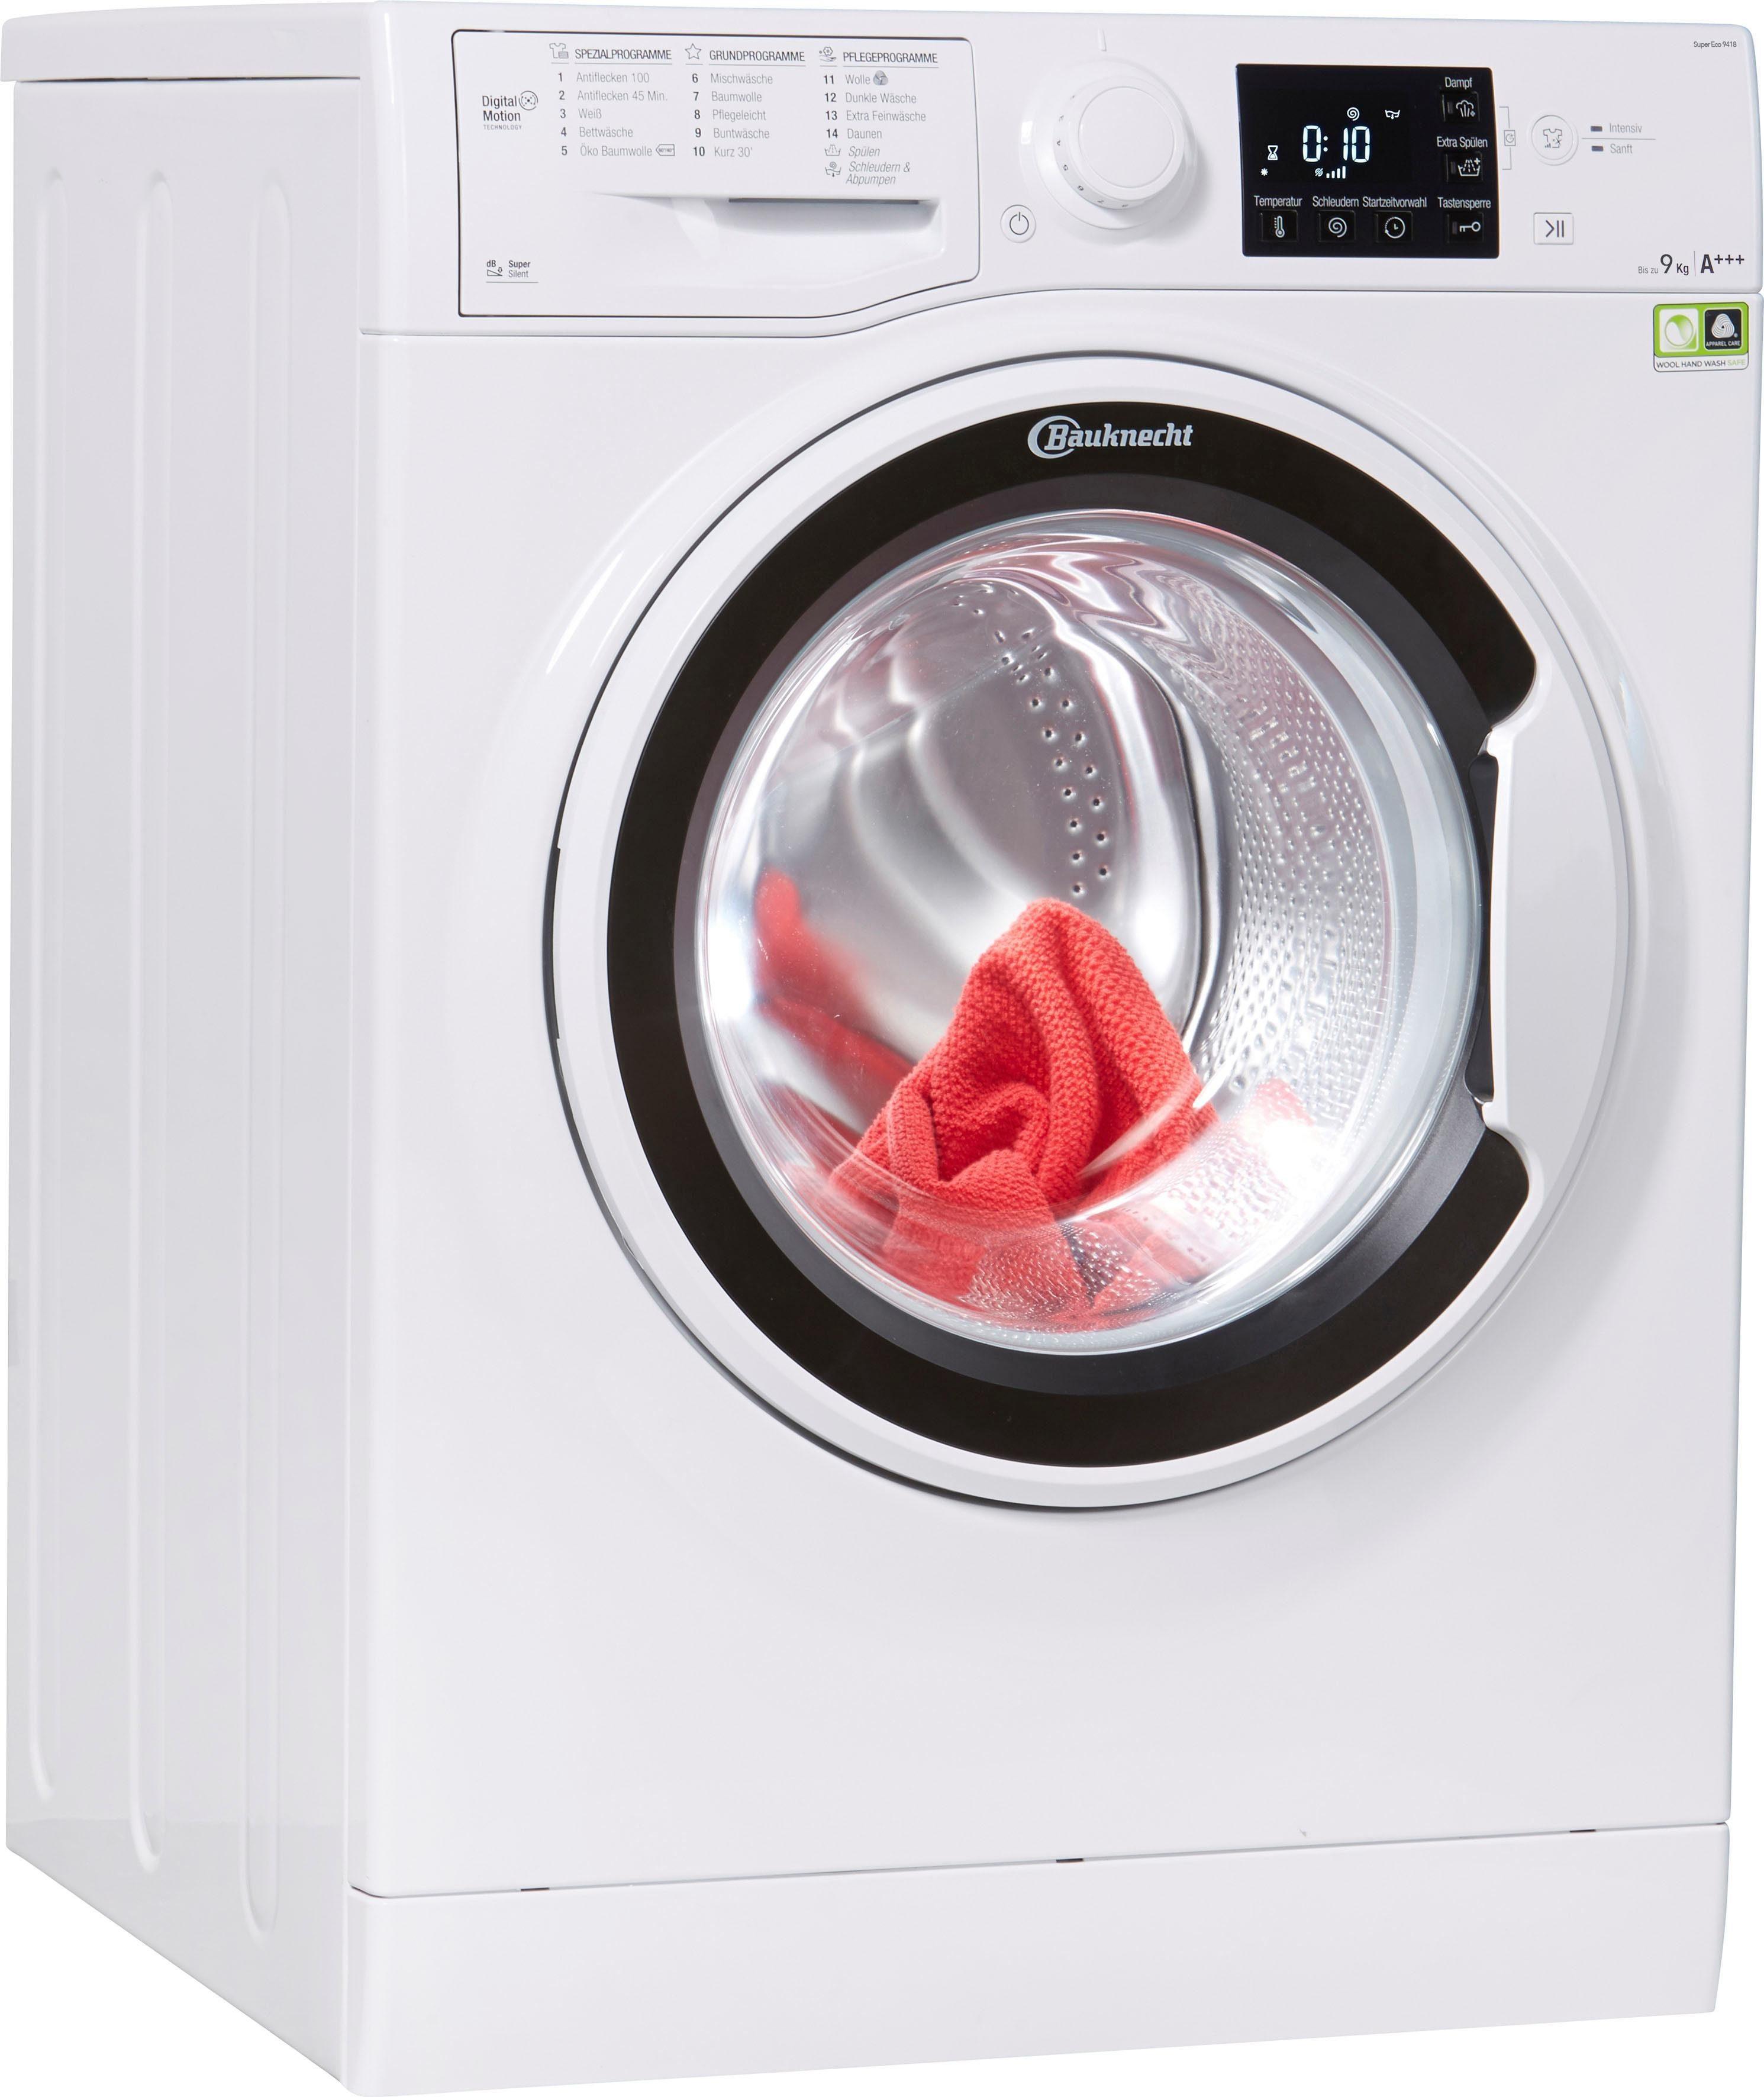 BAUKNECHT Waschmaschine Super Eco 9418, 9 kg, 1400 U/Min